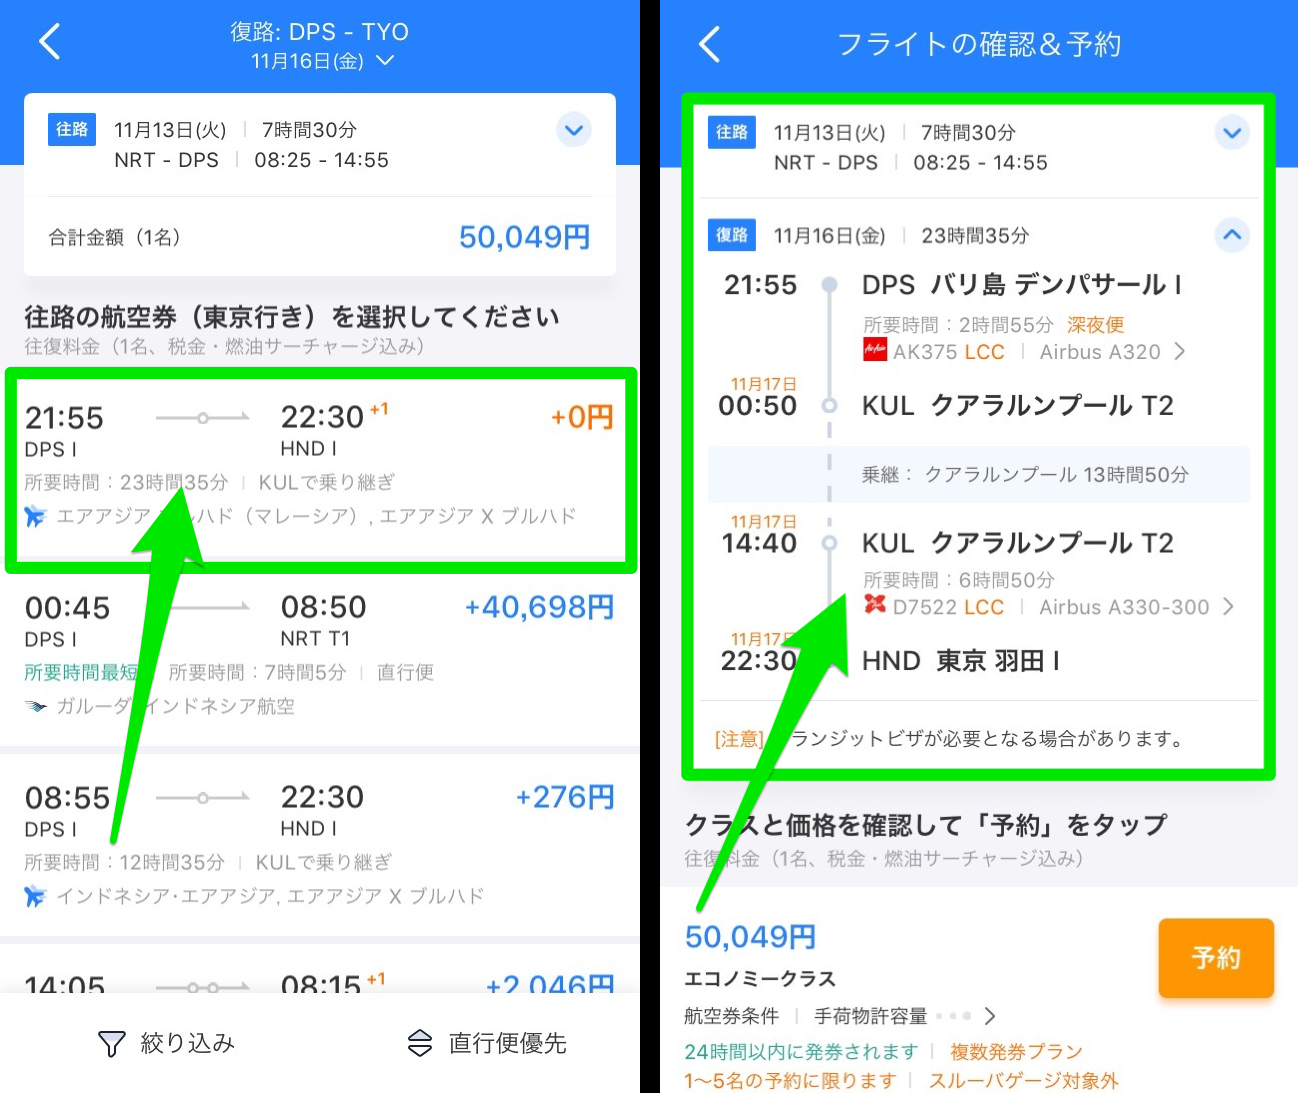 Trip.com(旧Ctrip)アプリで復路の航空券予約